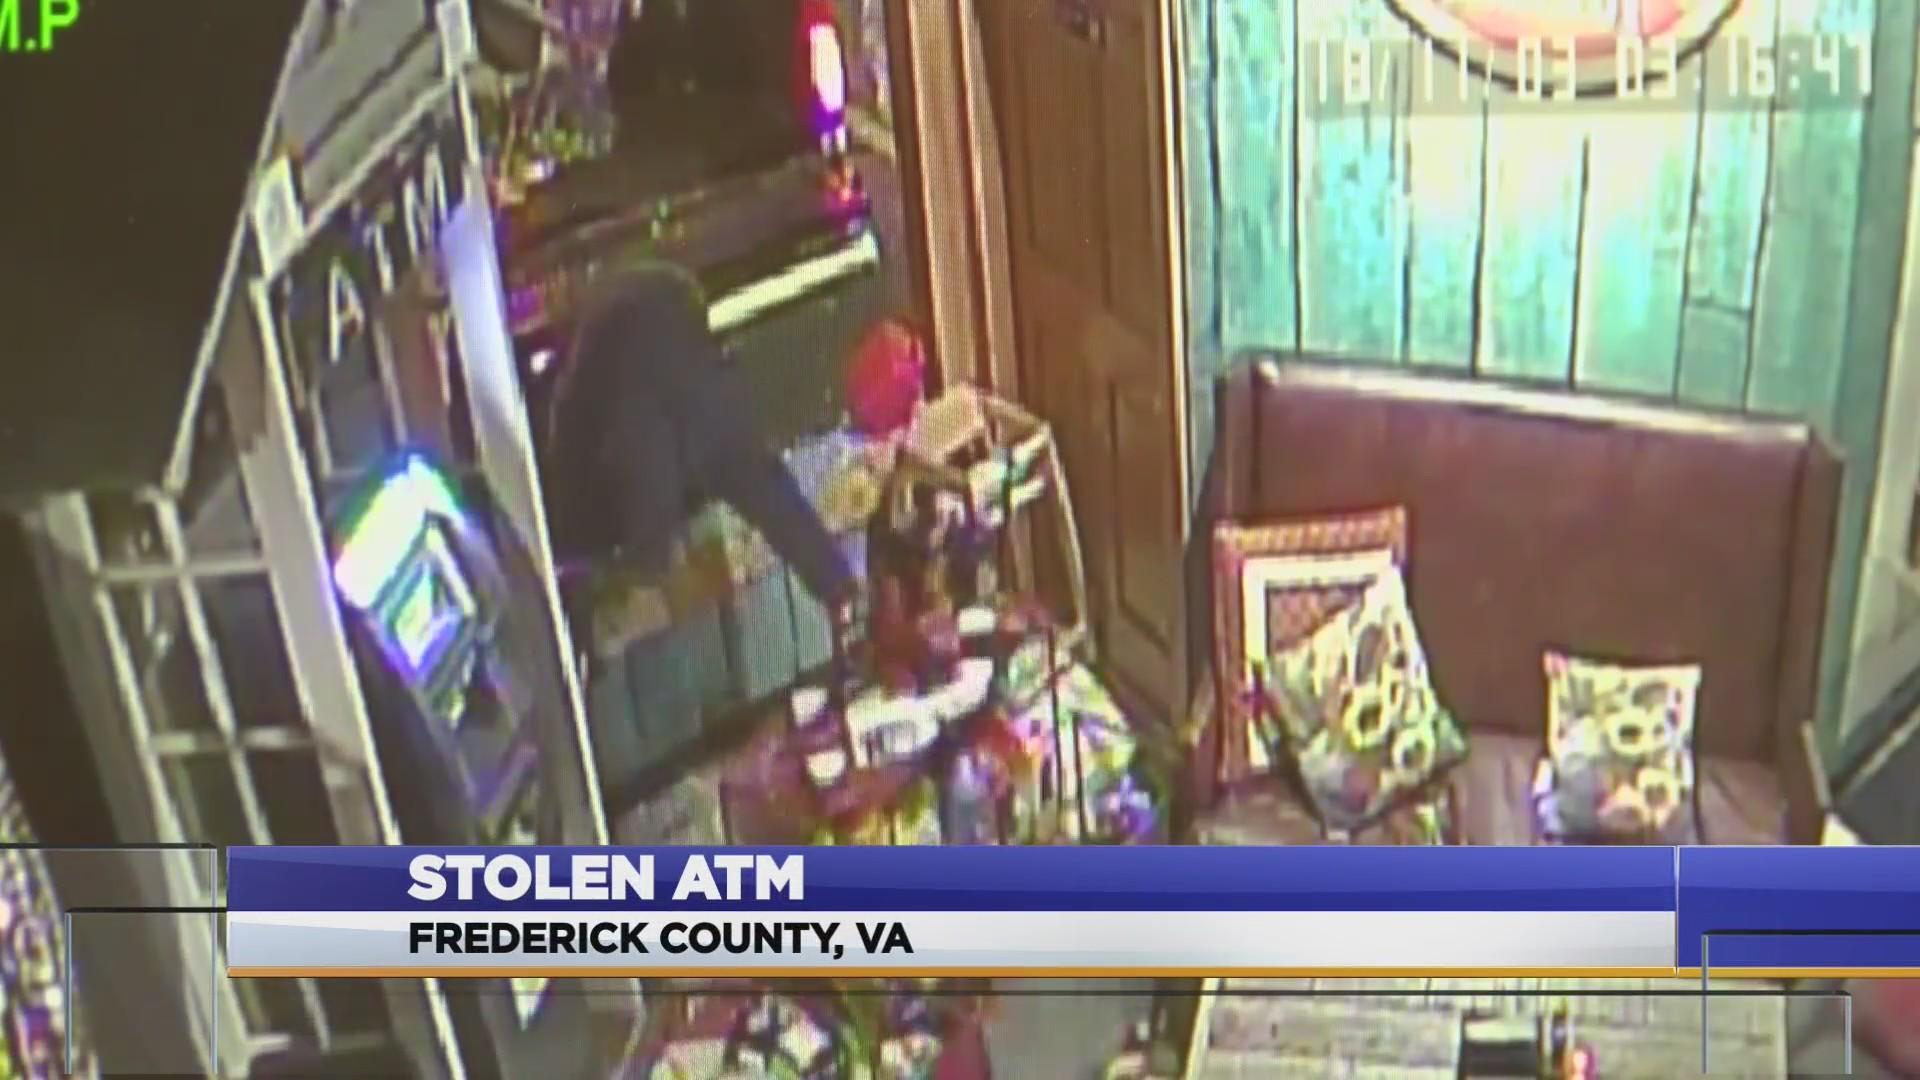 ATM_stolen_0_20181107222415